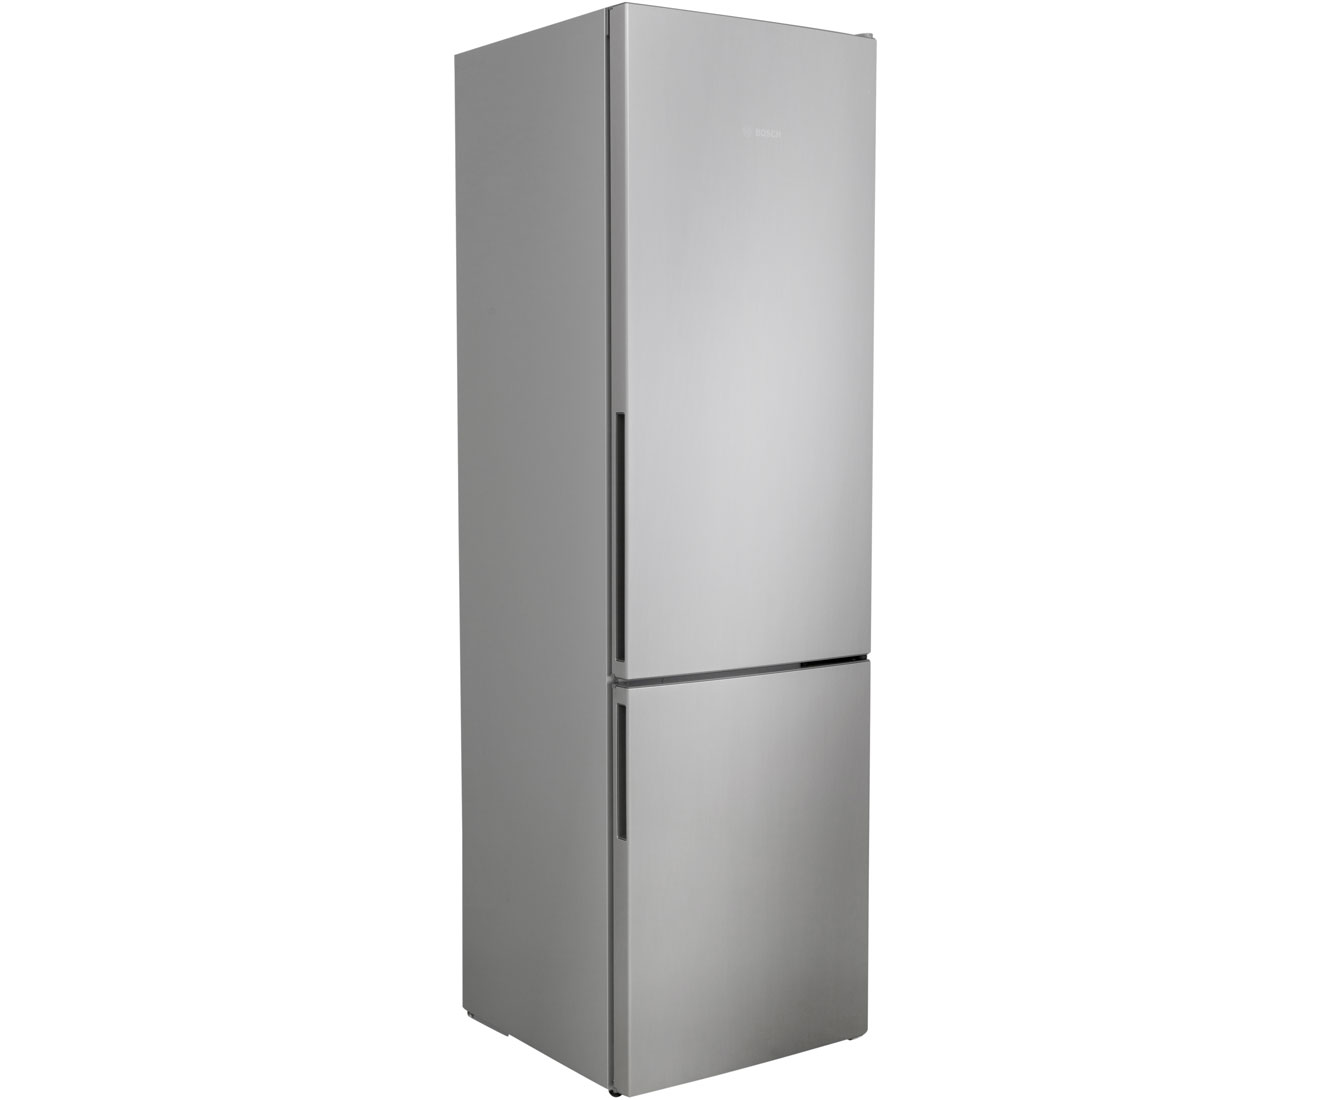 Bosch Kühlschrank Nass : Bosch serie kgv vl kühl gefrierkombination er breite